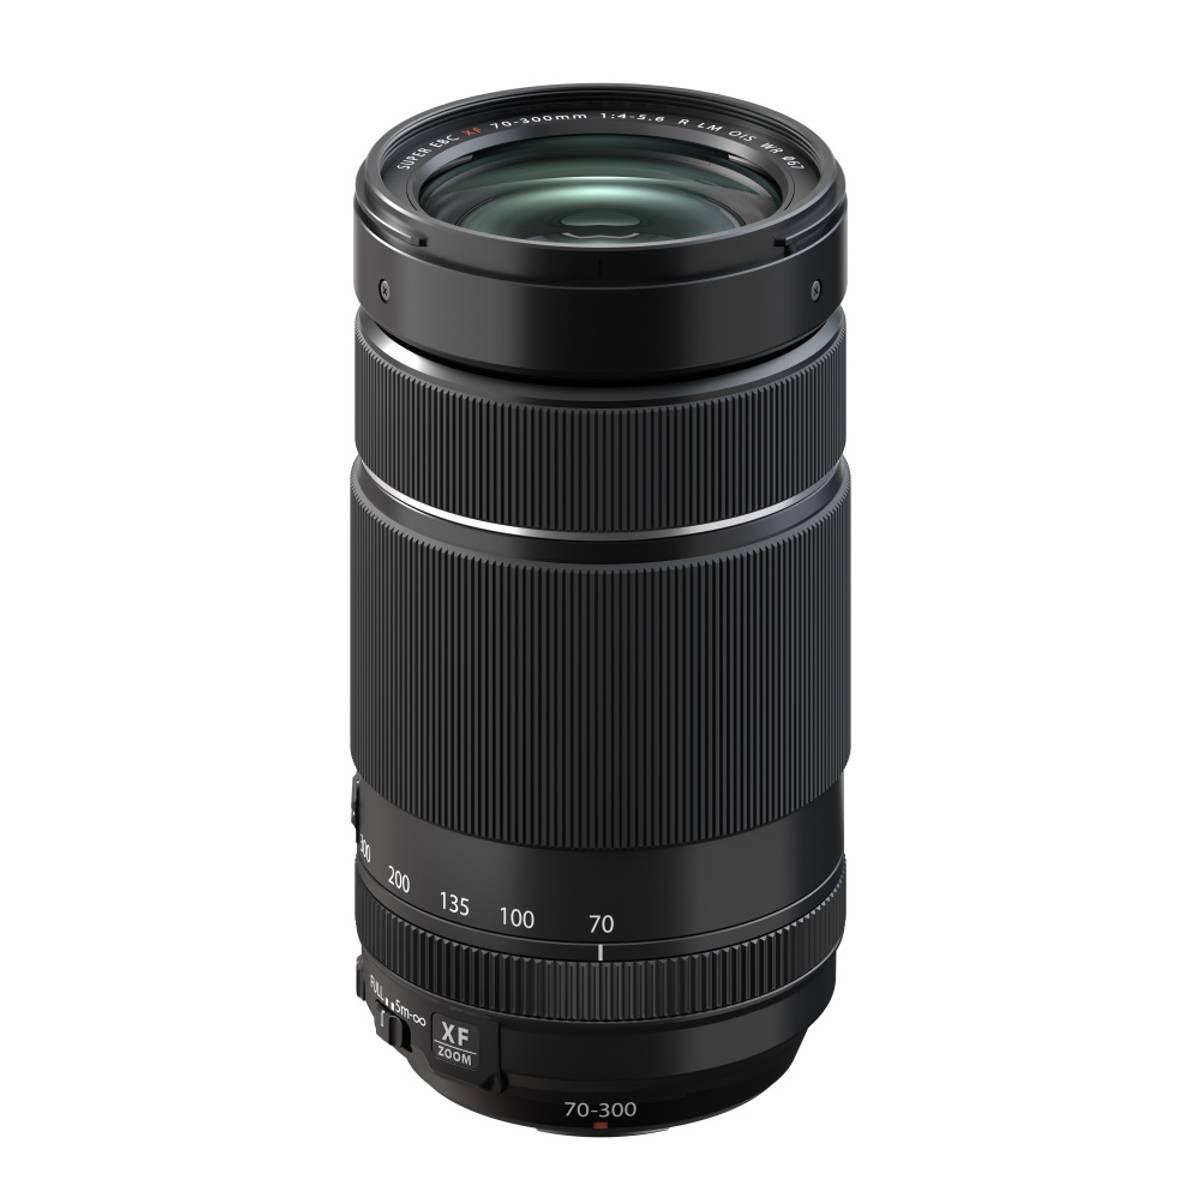 Fujifilm  Fujinon XF 70-300mm / f4-5,6 LM OIS WR